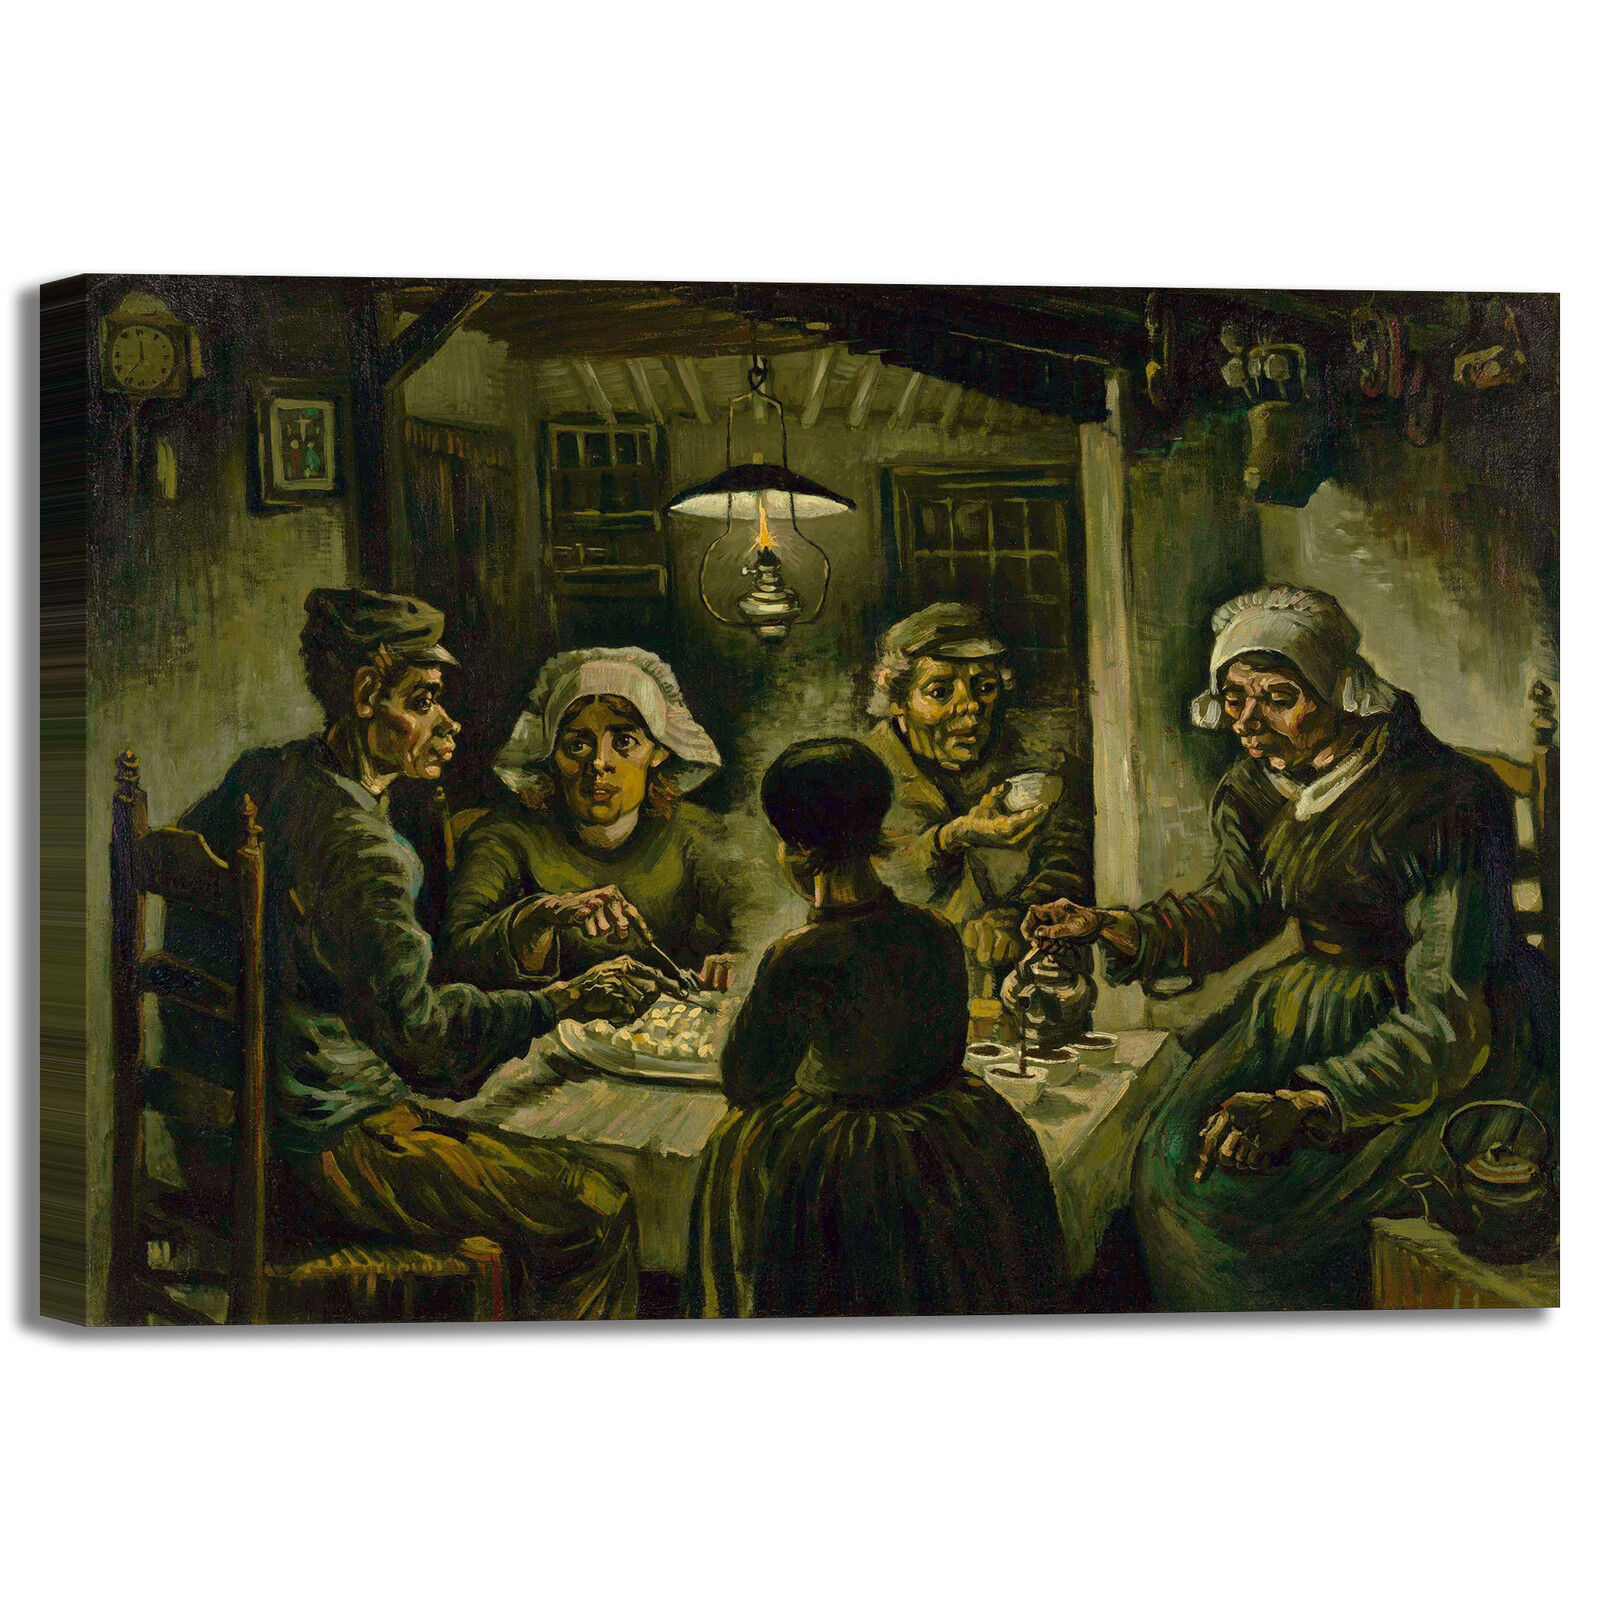 Van Gogh i mangiatori di patate patate patate quadro stampa tela dipinto telaio arrossoo casa 106abf